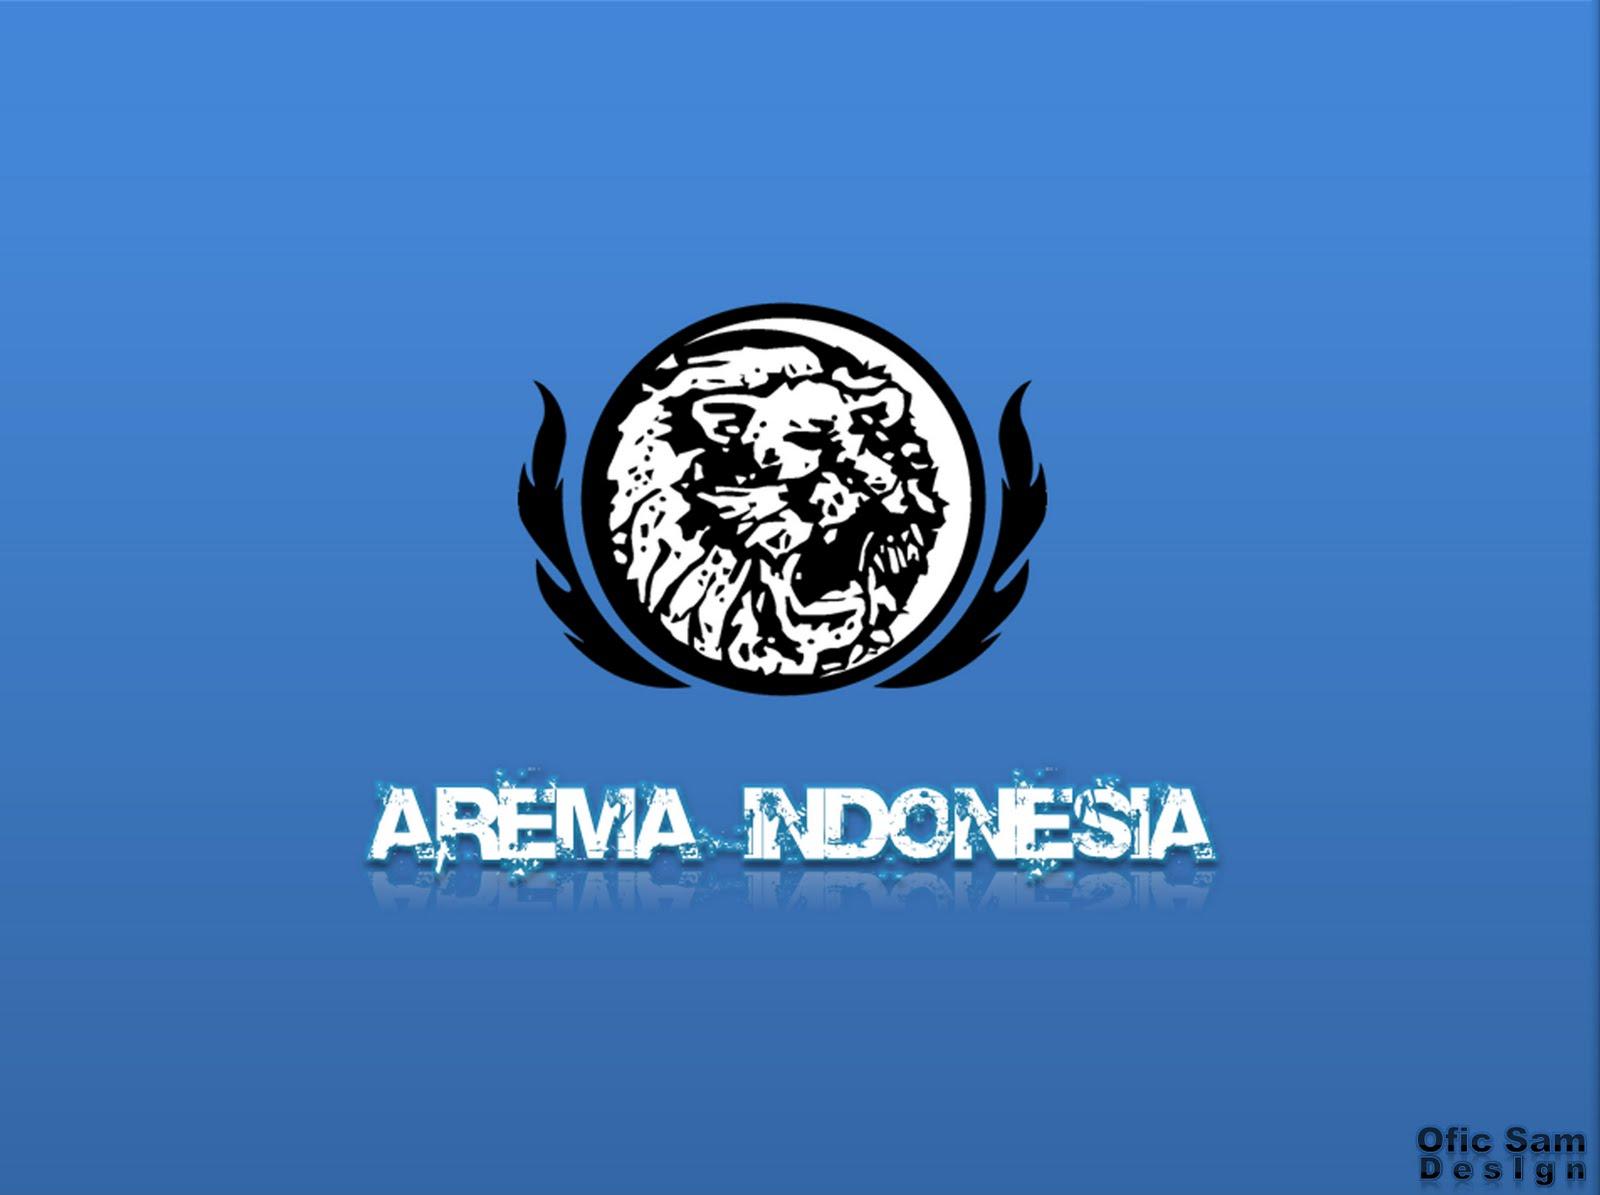 http://3.bp.blogspot.com/-nmgeRFfjdFc/Tb-MQyq4ixI/AAAAAAAAAKM/eibeO1Ma1ho/s1600/wallpaper+arema+indonesia+mei+2011+by+ofic+sam+_boy_gassipers@yahoo.co.id+%2816%29.jpg